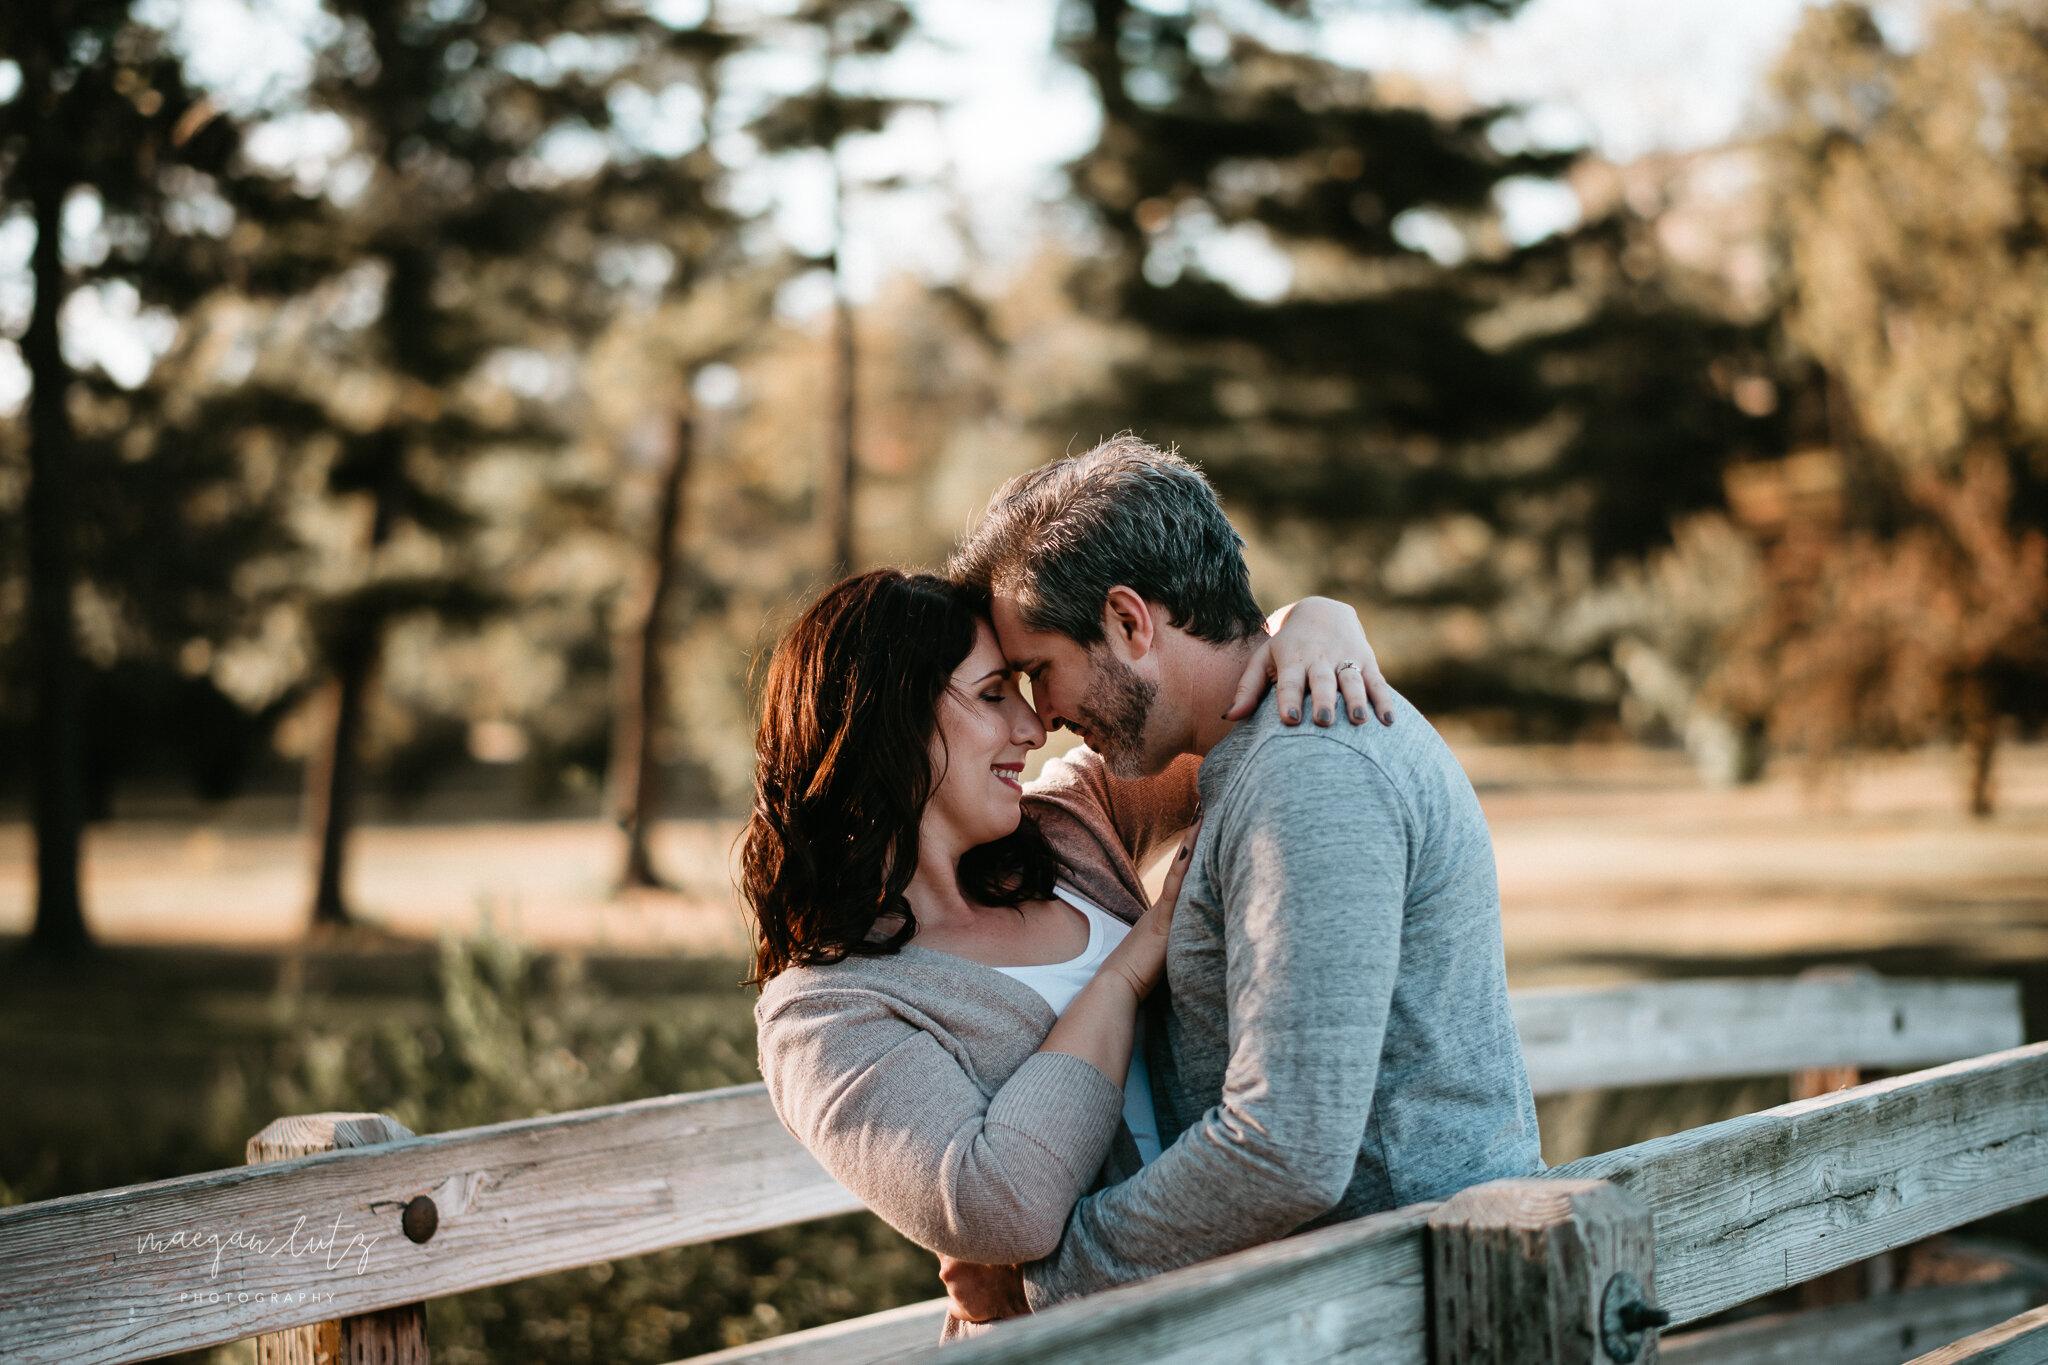 NEPA-Lehigh-Valley-Wedding-Engagement-photographer-at-the-rose-garden-allentown-PA-15.jpg